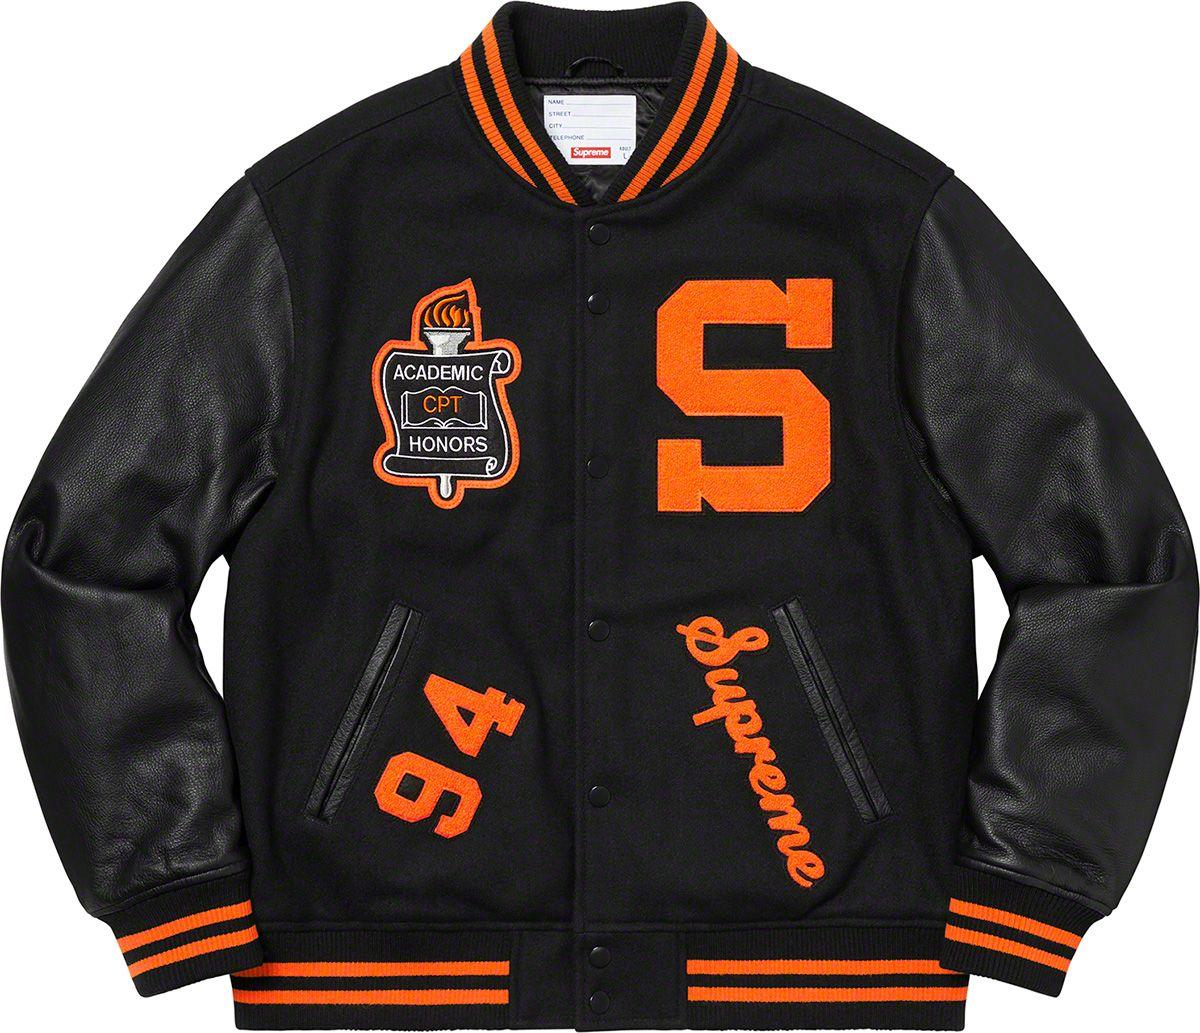 Supreme Team Varsity Jacket Varsity jacket, Jackets, Varsity